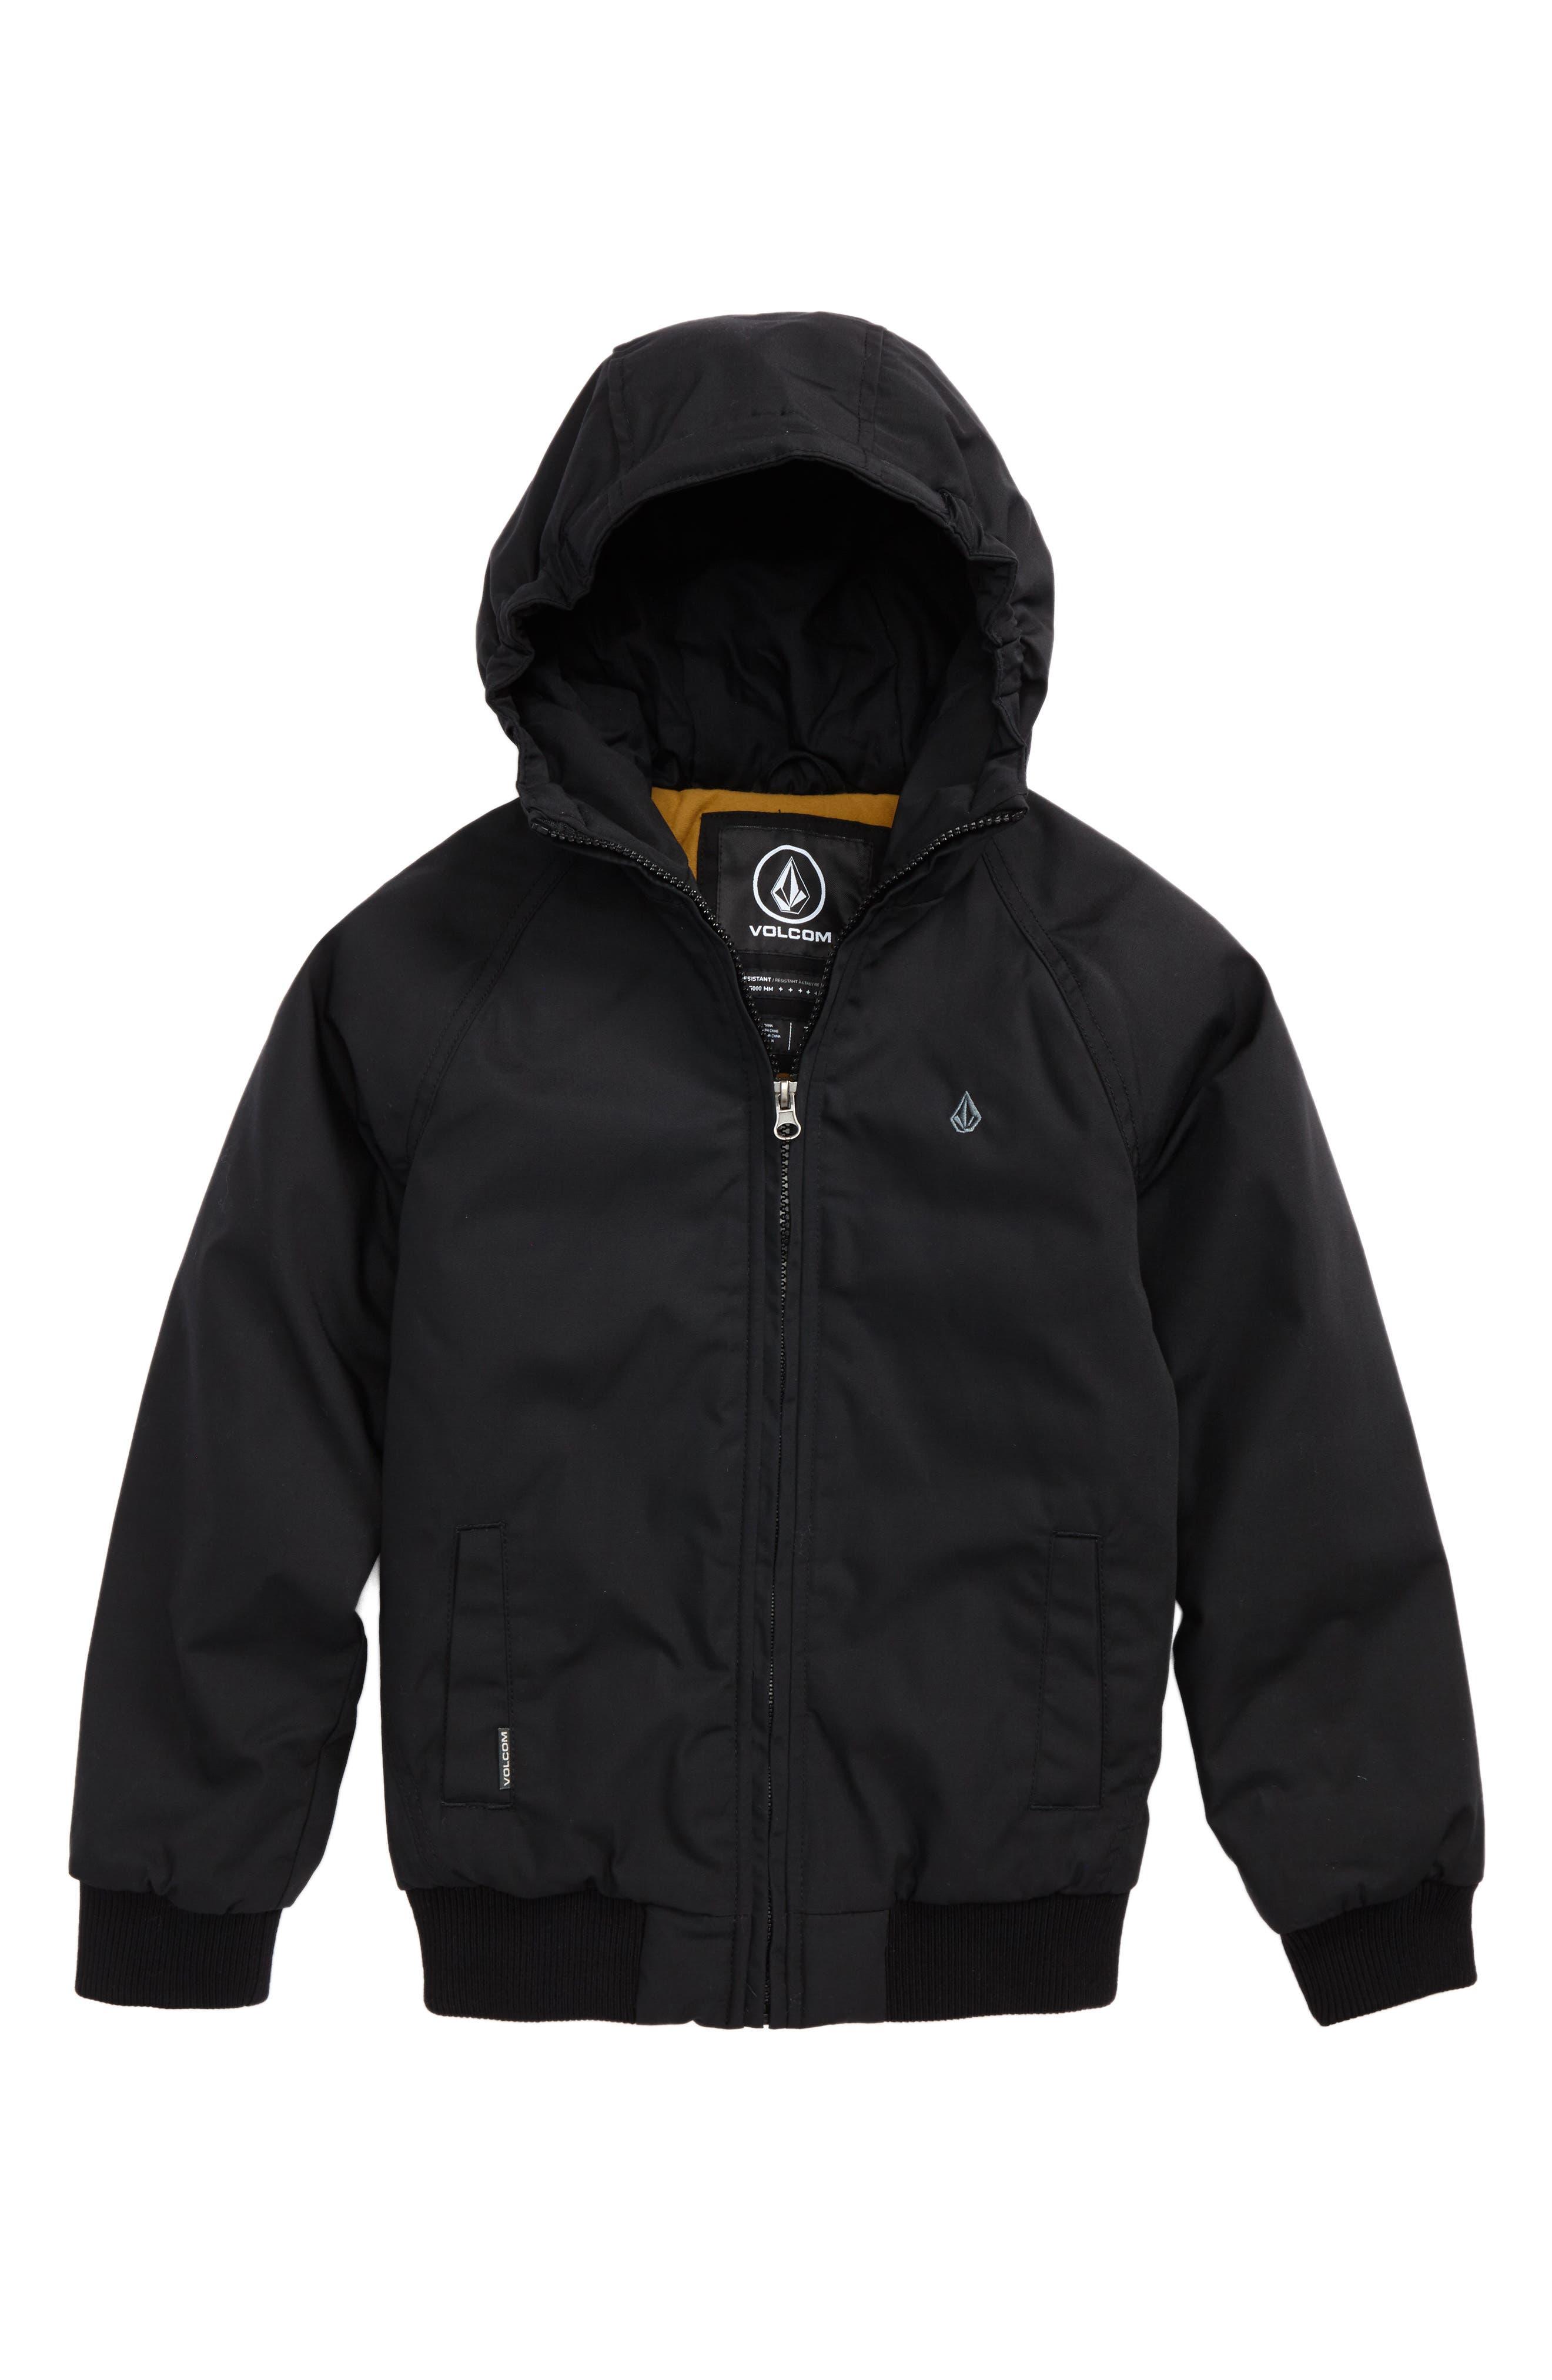 Boys Volcom Hernan Heavyweight Hooded Jacket Size XL (1820)  Black